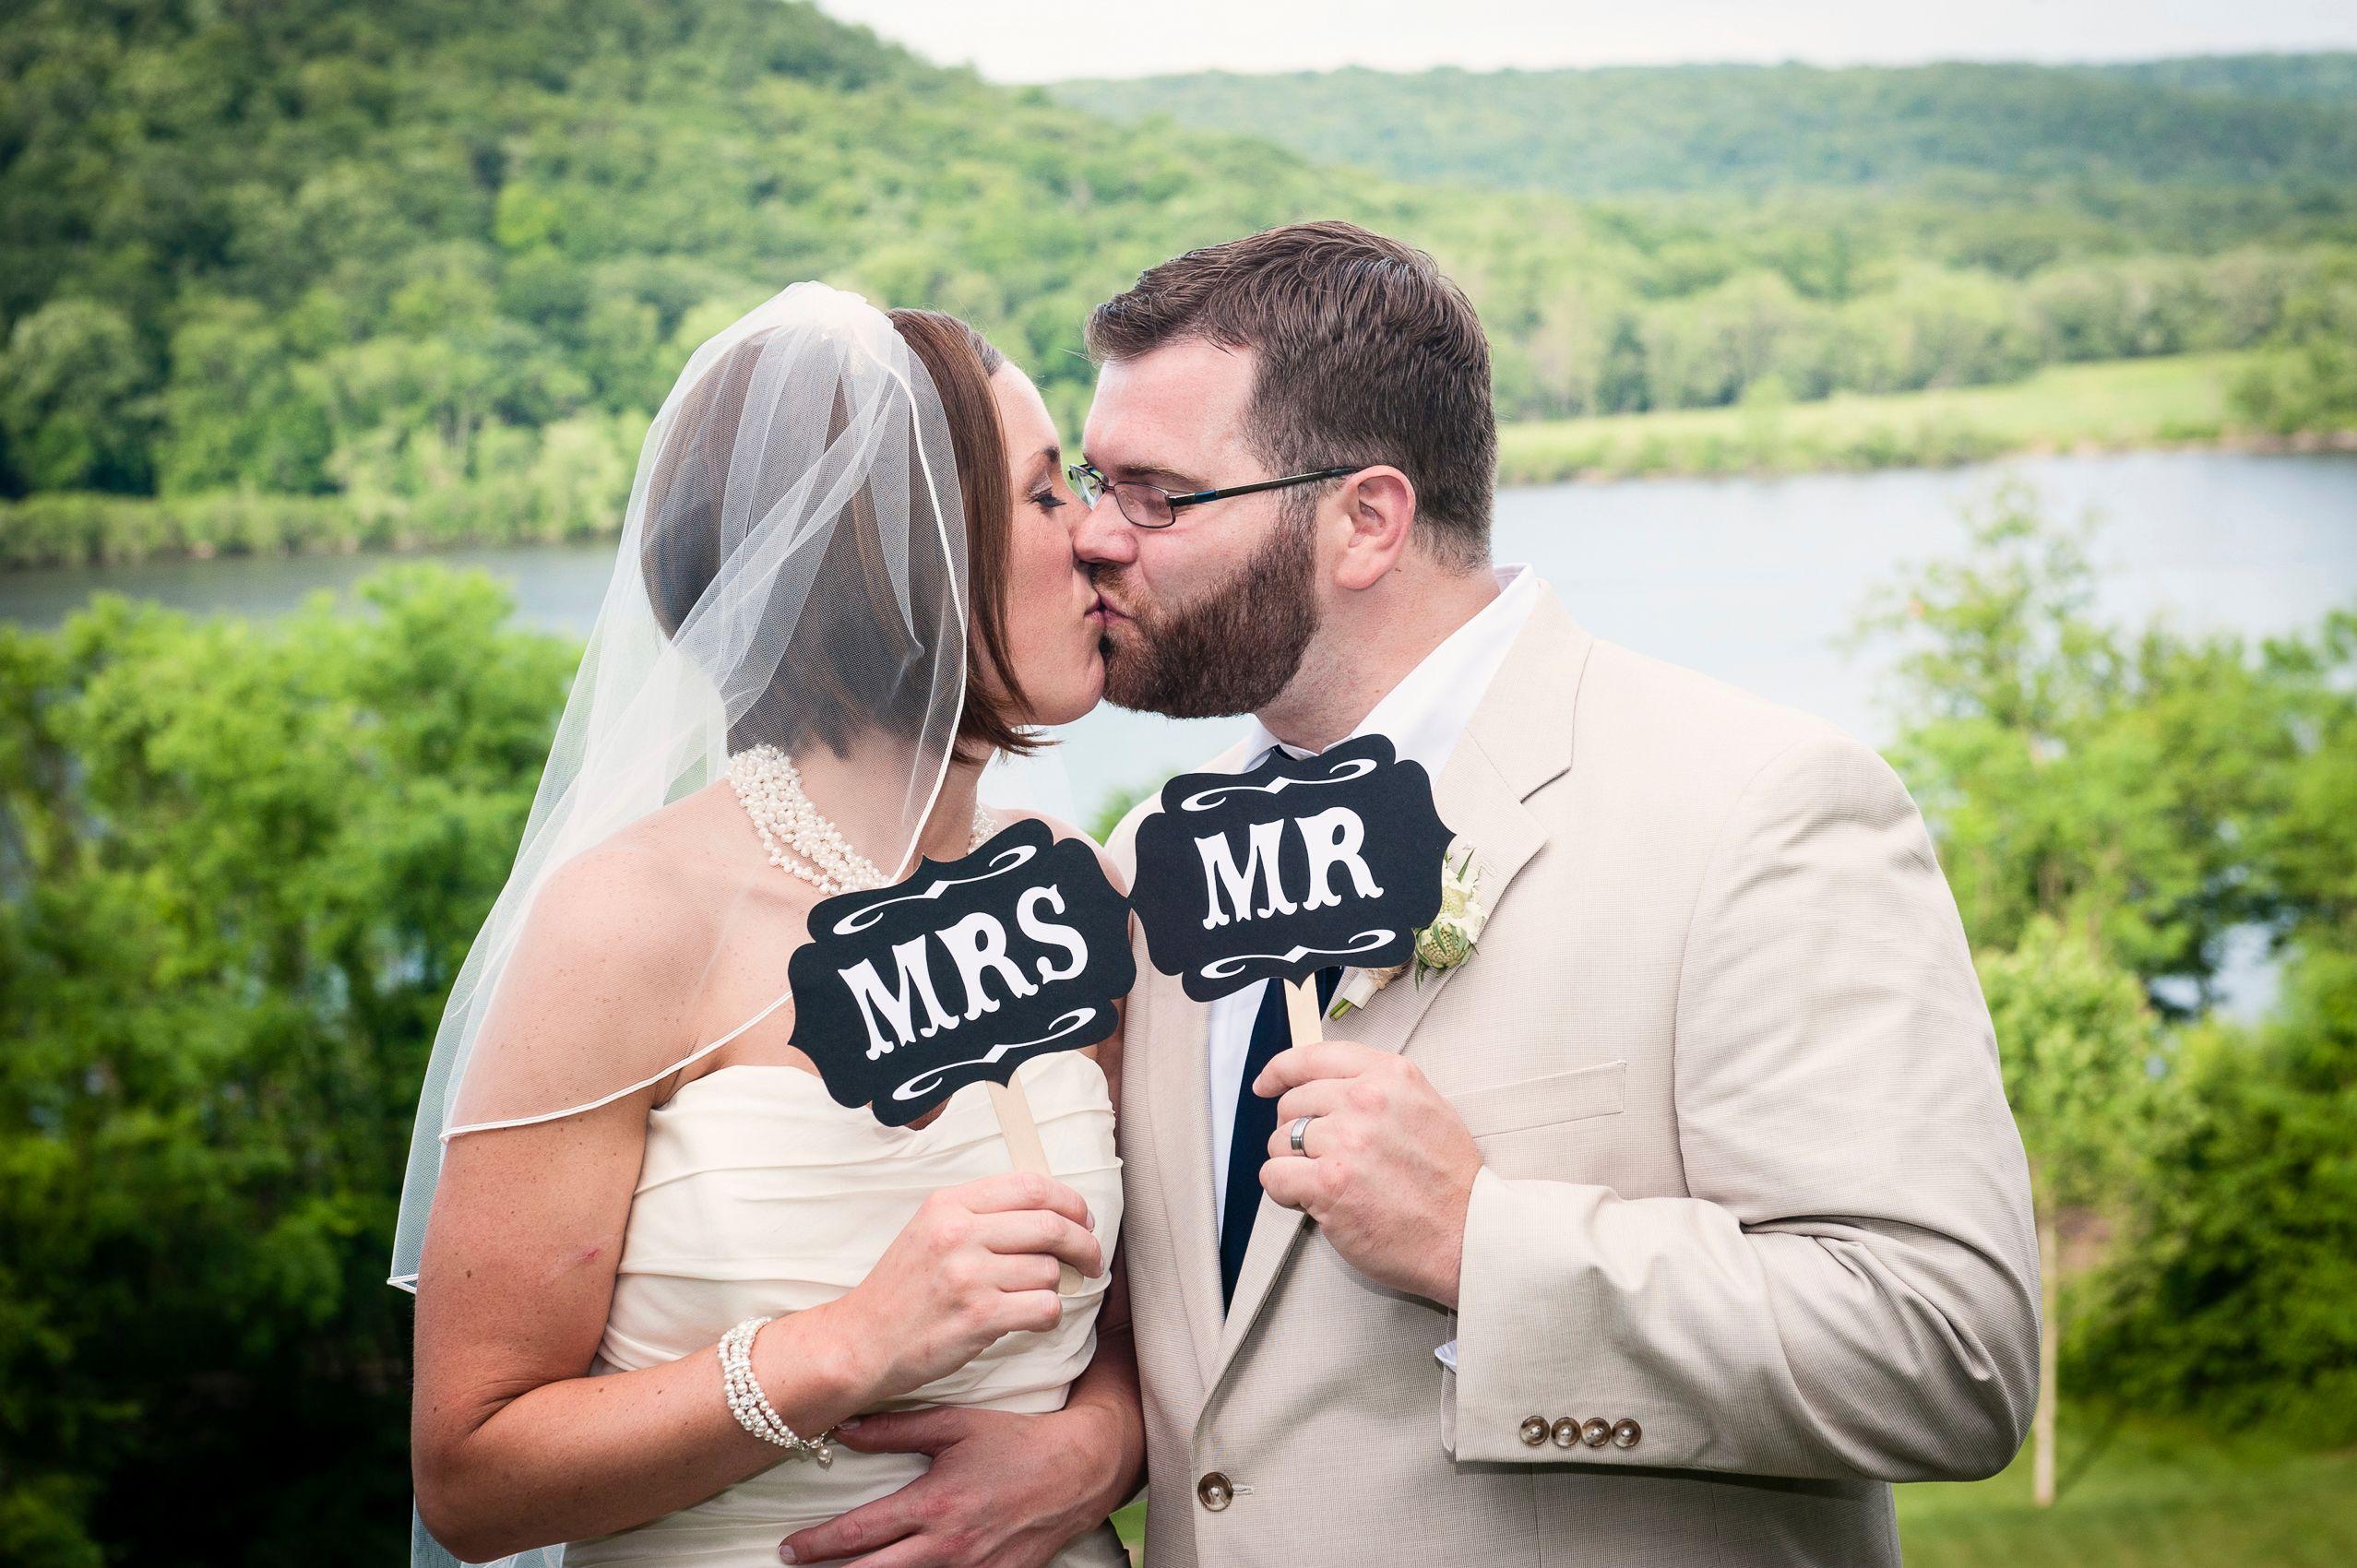 West_Hartford_Connecticut_Wedding_Photography-132.jpg